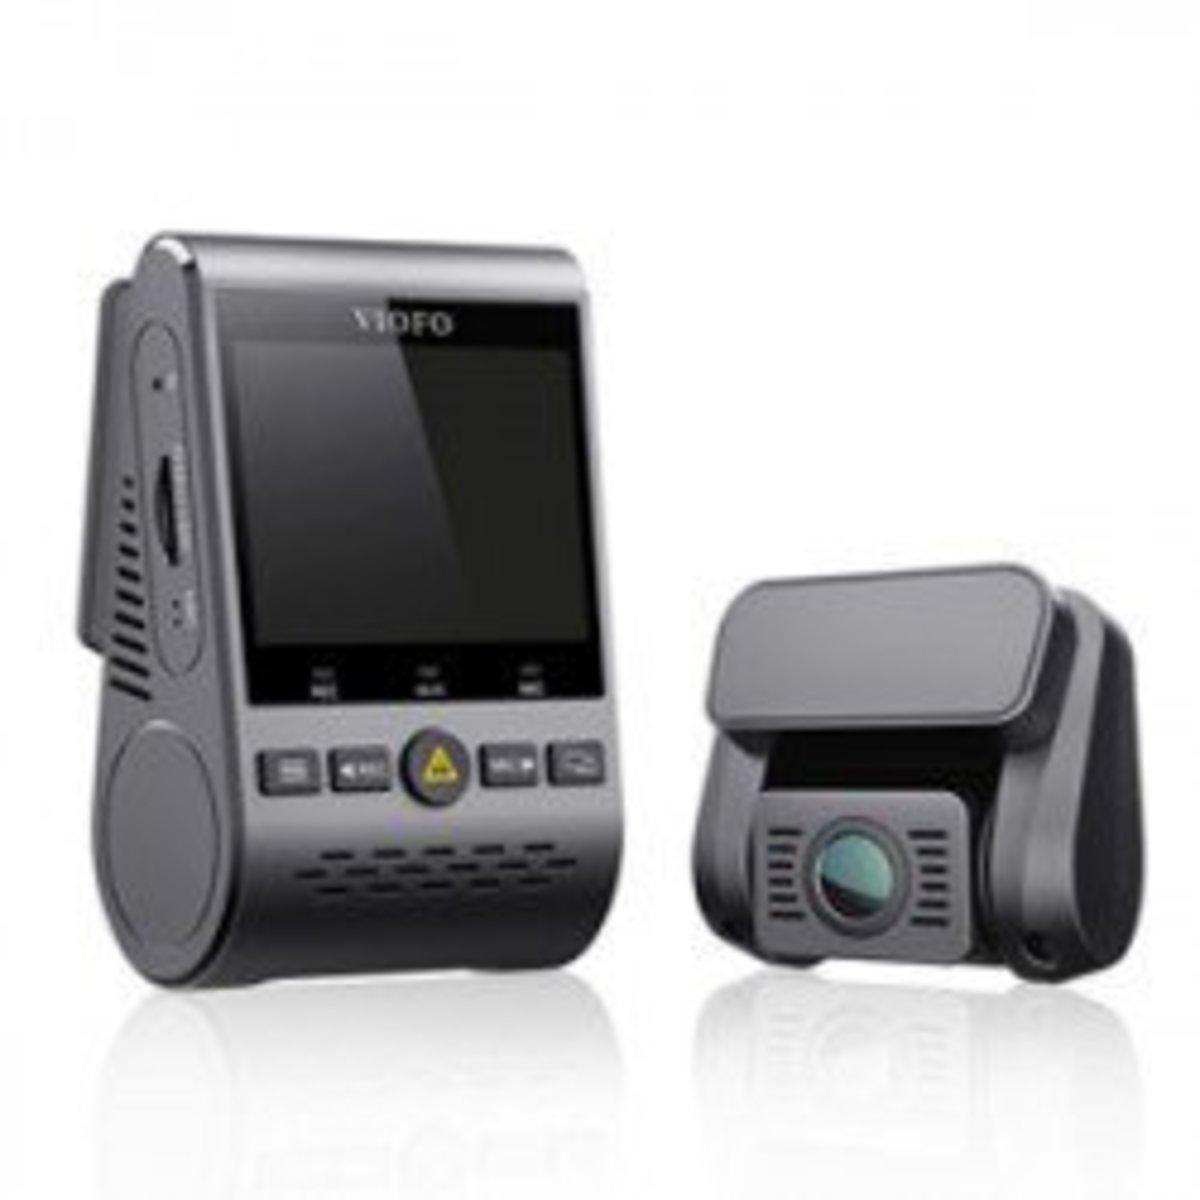 A129 Duo GPS前後鏡SONY夜視鏡頭全高清行車記錄儀